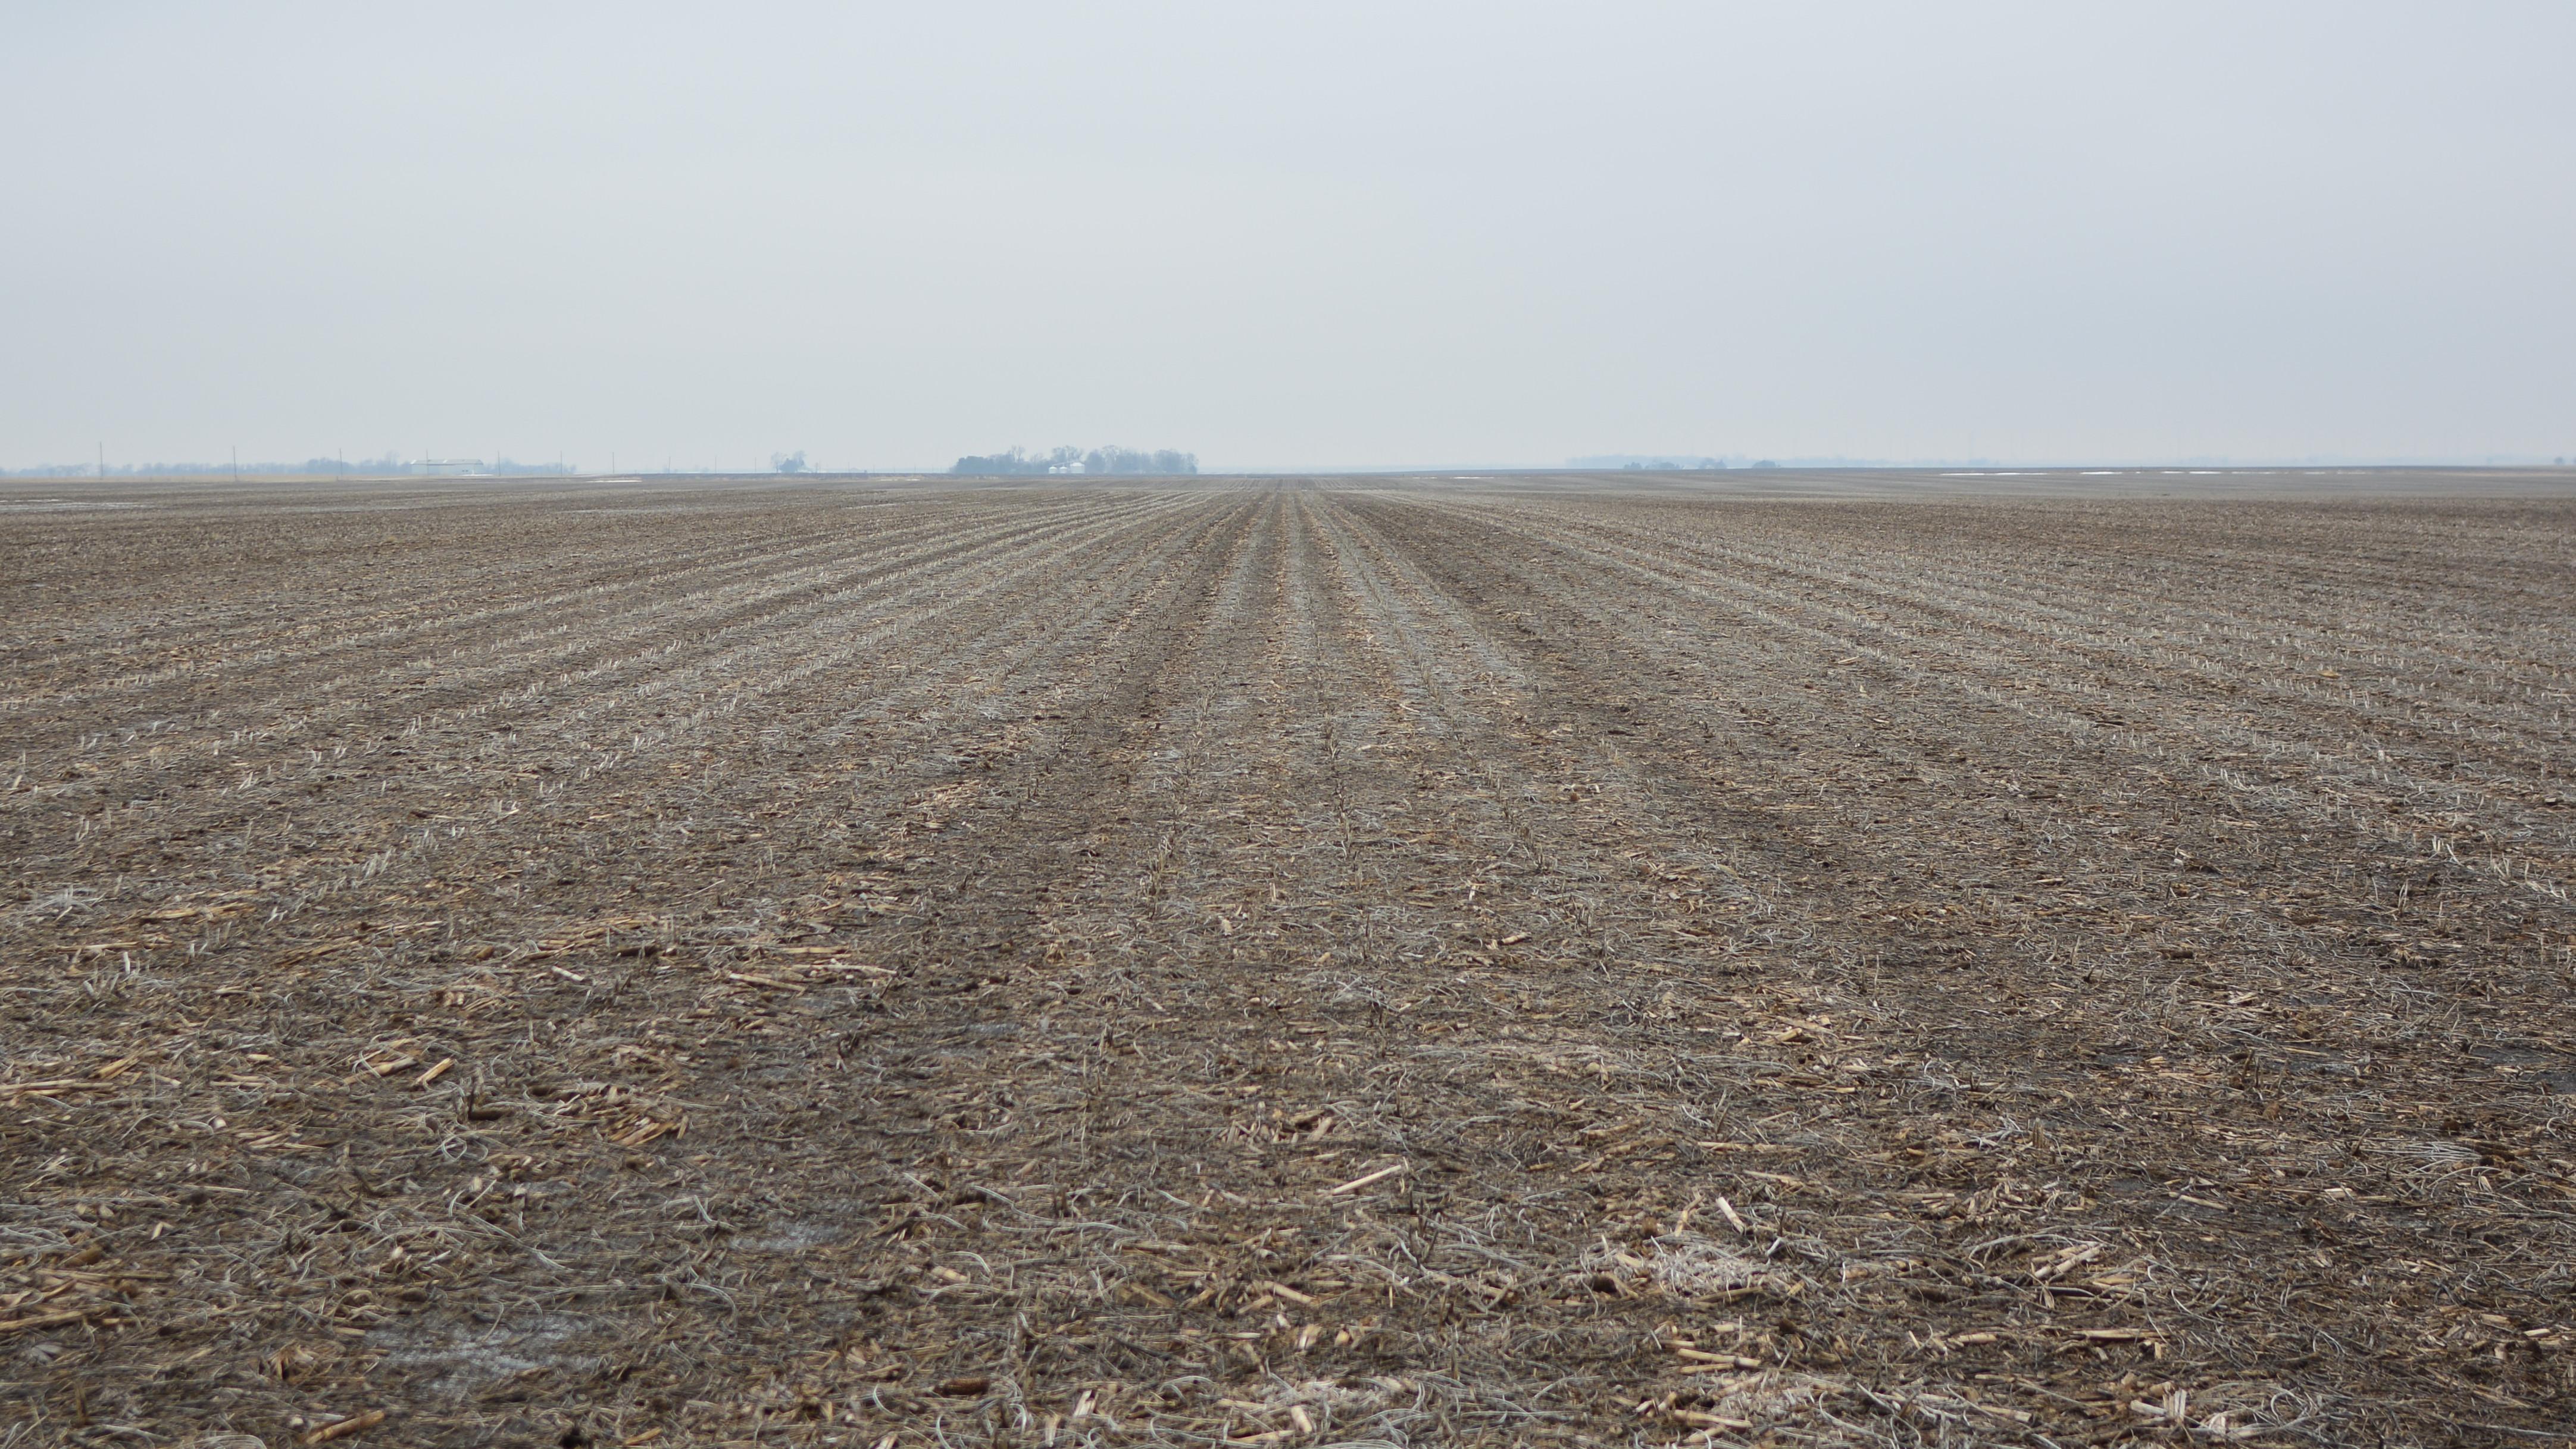 03.20.19 - Iroquois County IL - photo3